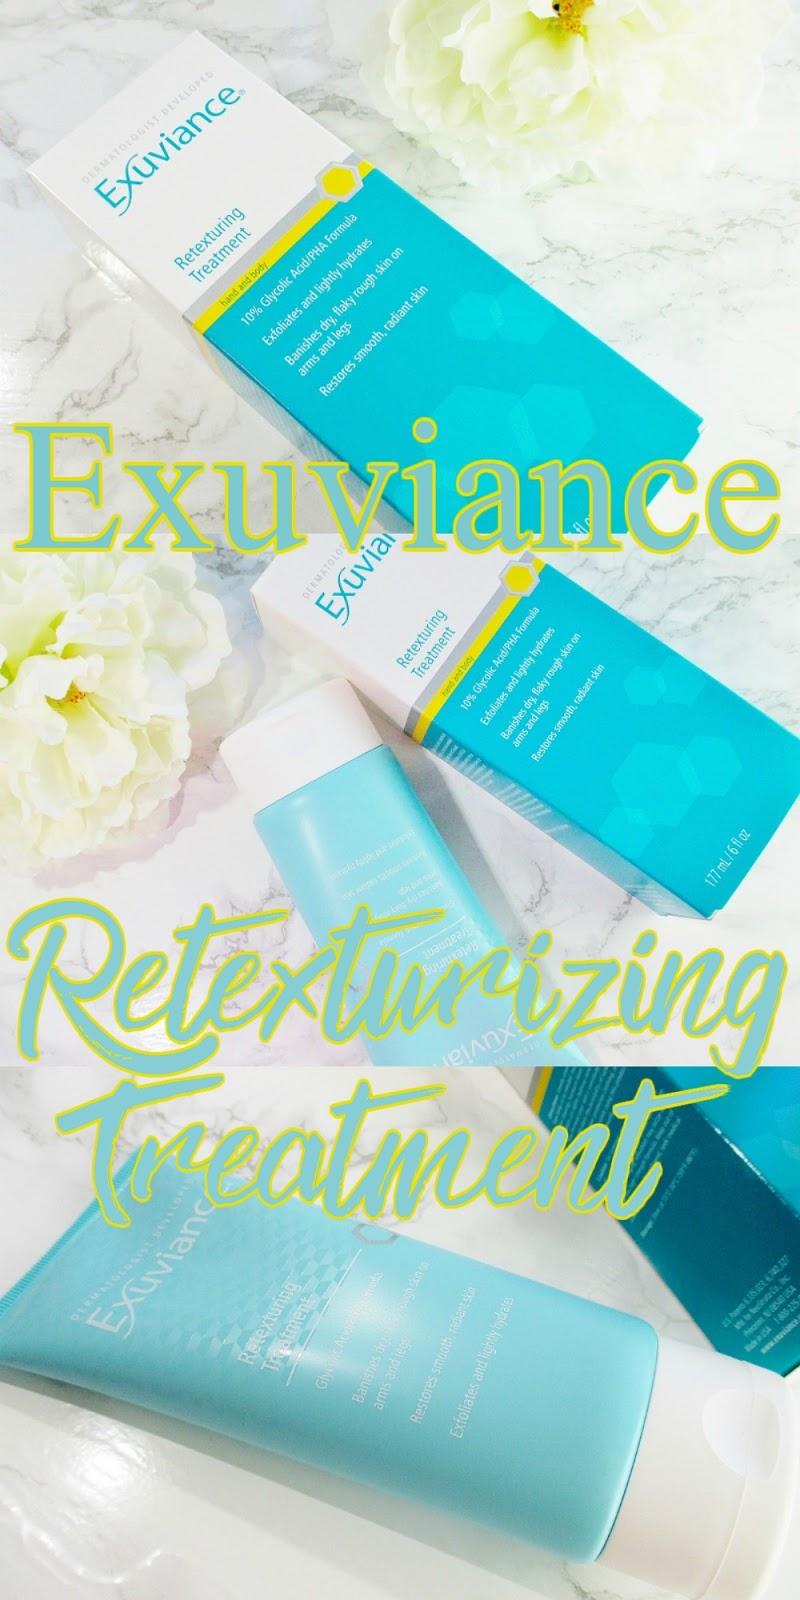 exuviance-retexturizing-treatment-3